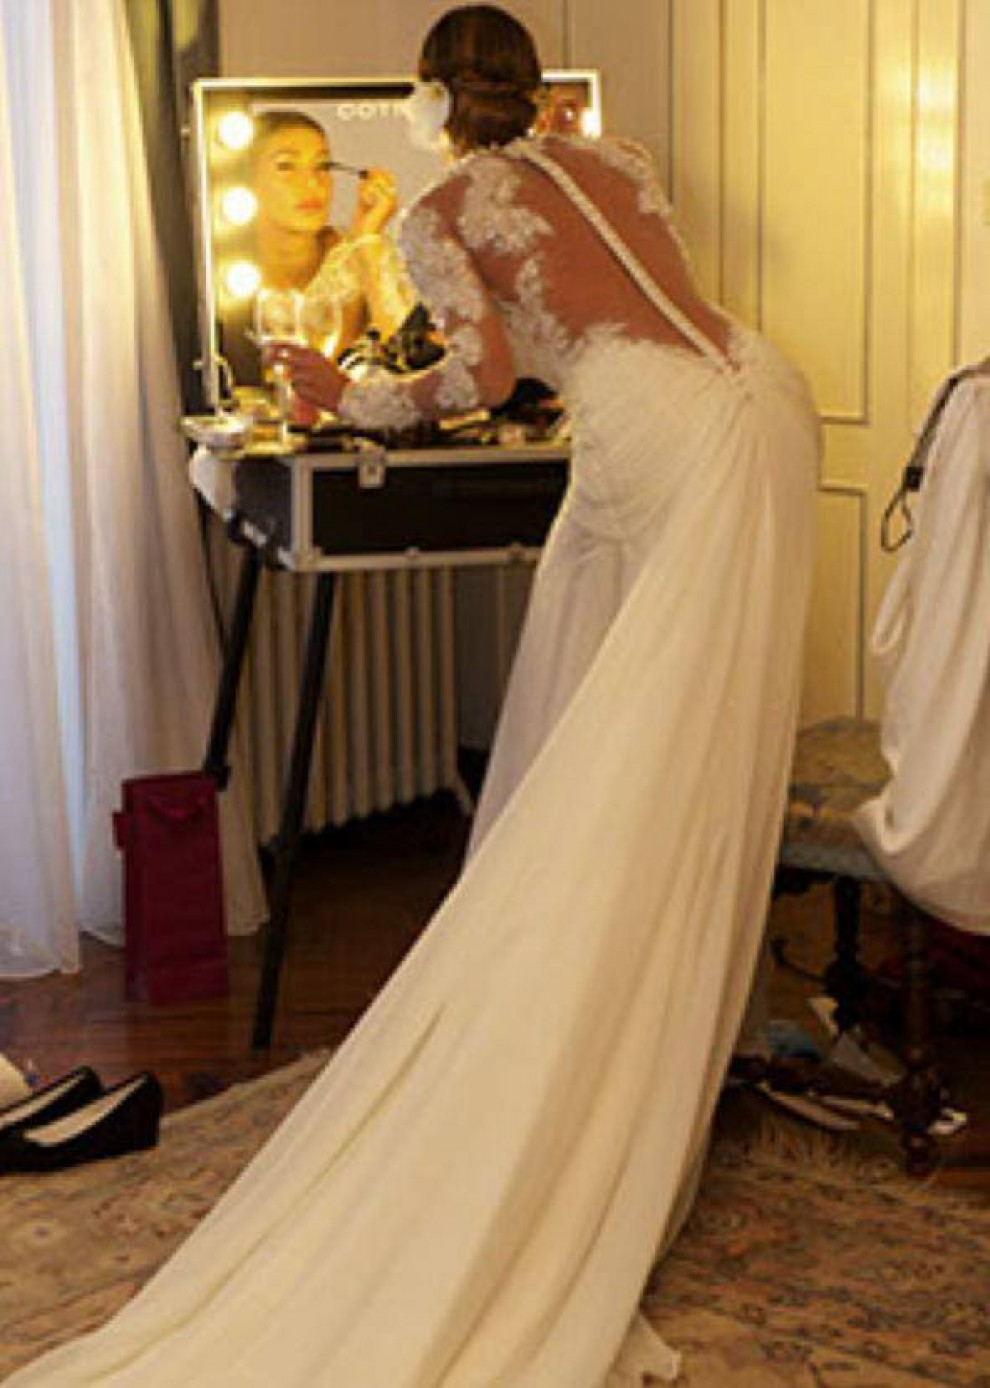 1a32d1a7b10b Abito da Sposa Matrimonio Belen Rodriguez - Blog MiamaStore